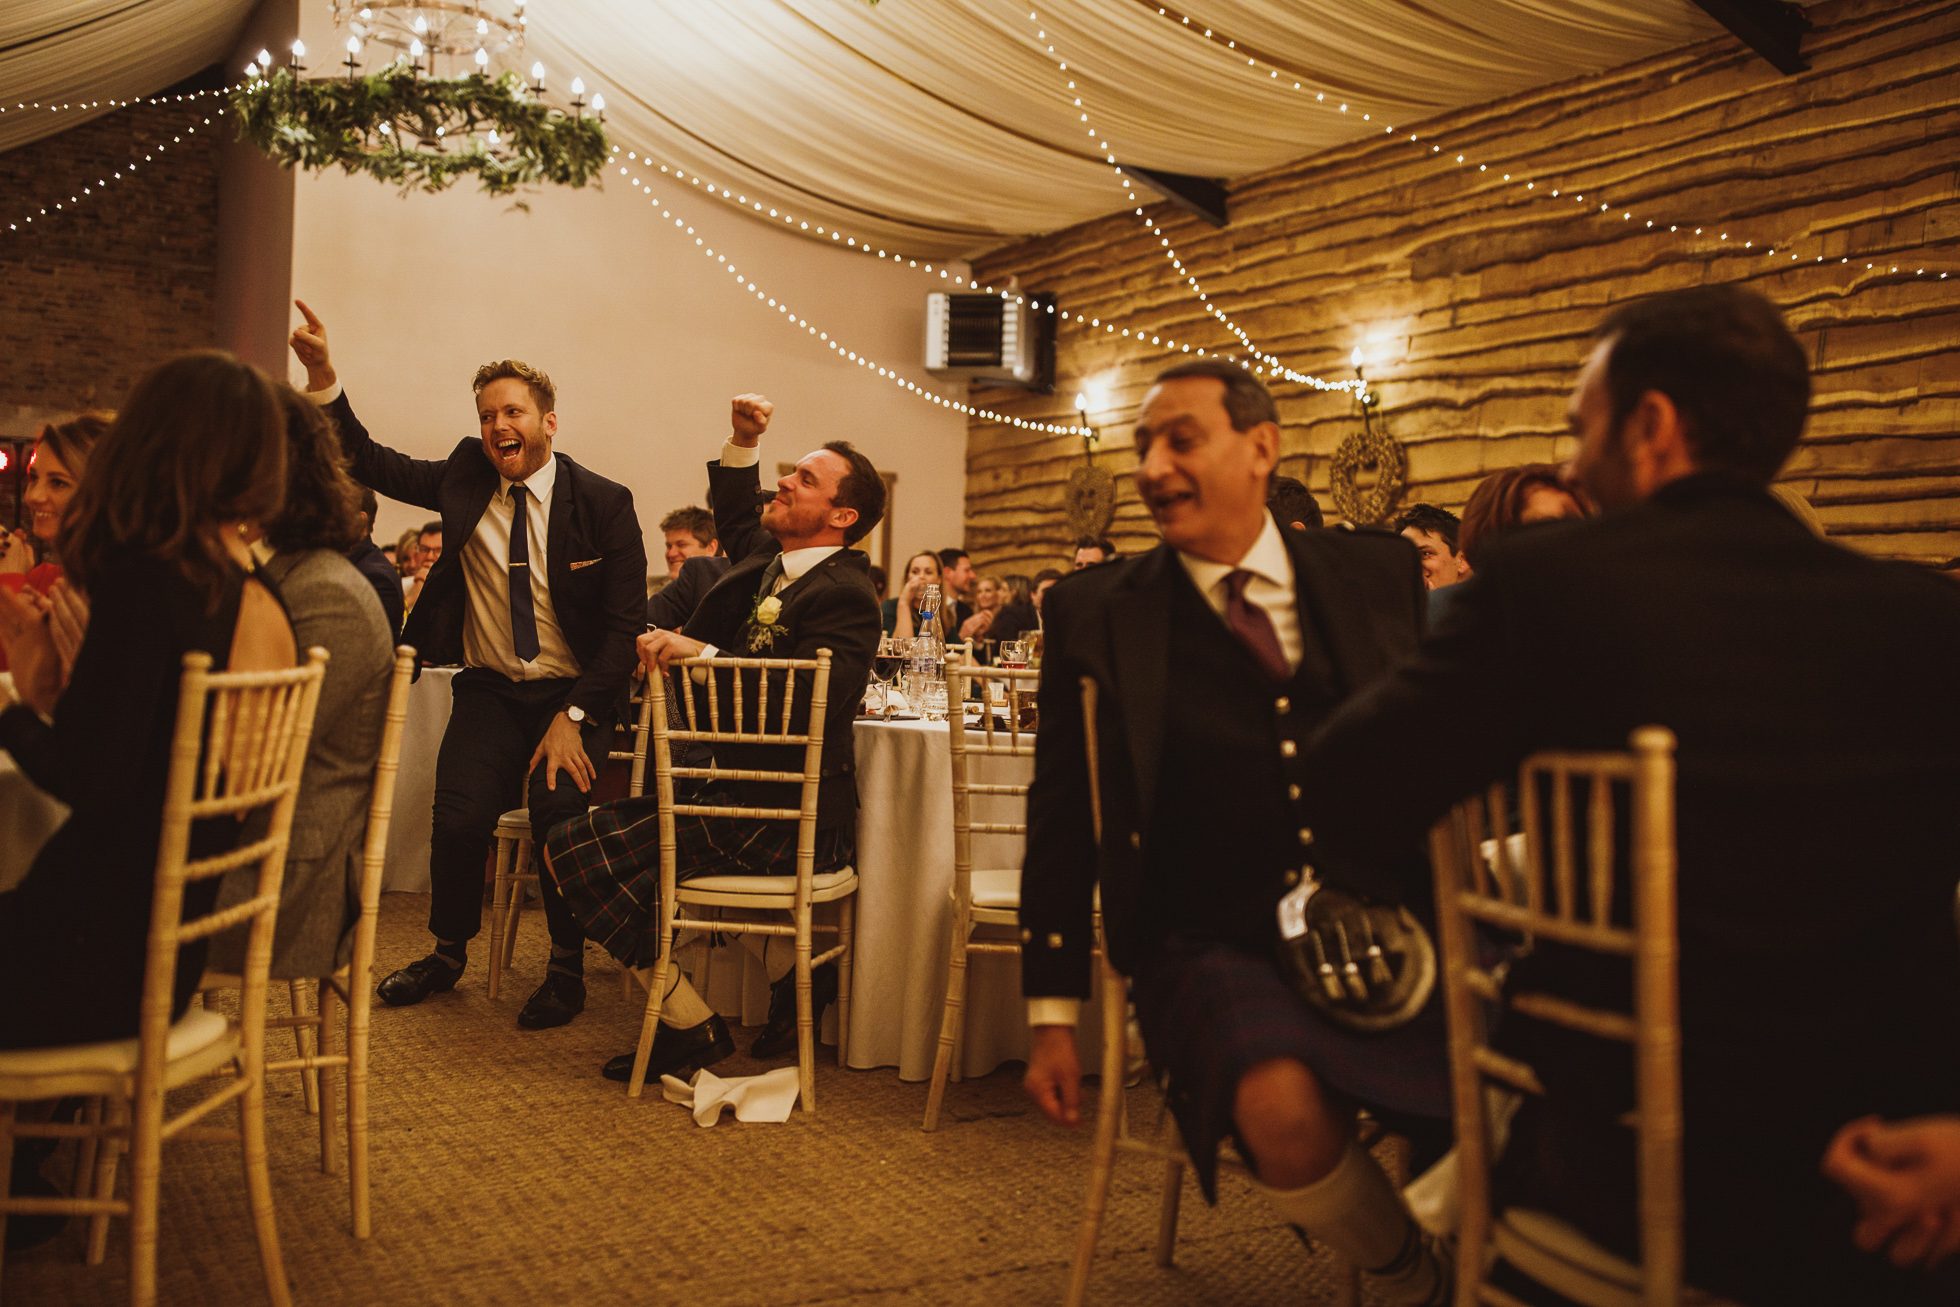 hornington_manor_wedding_photographer-106.jpg